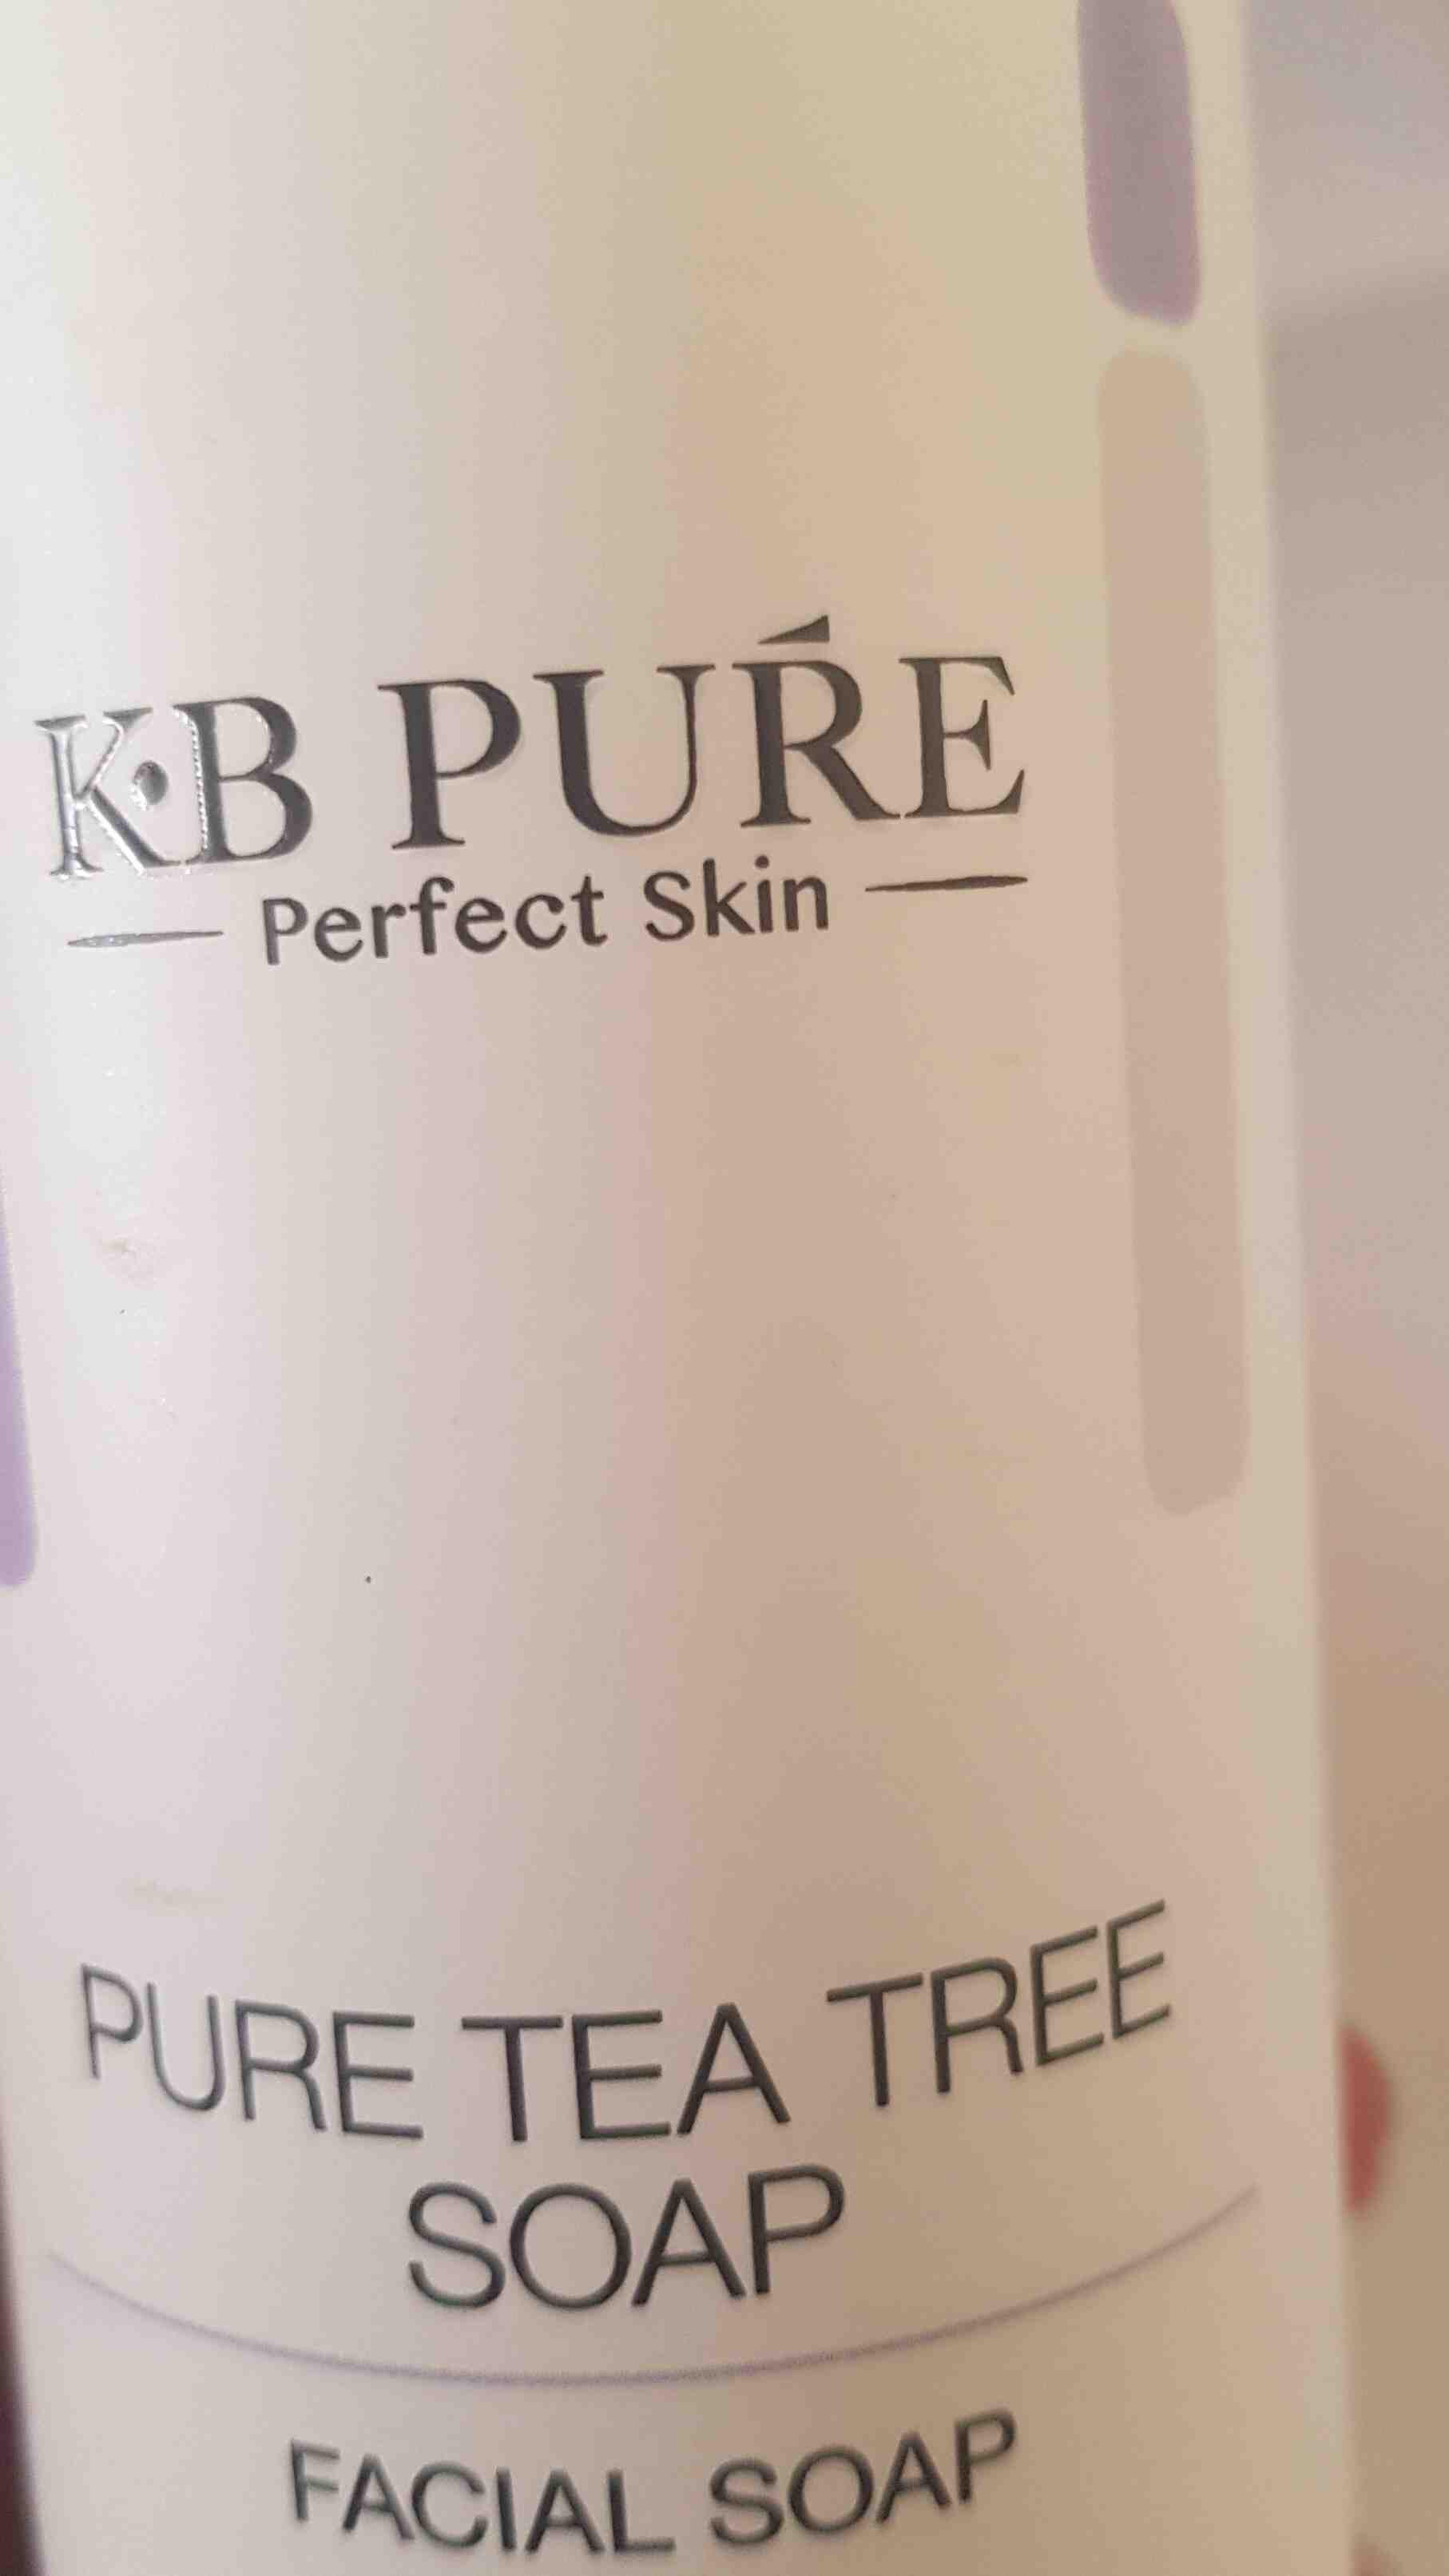 K.B PURE - Product - en